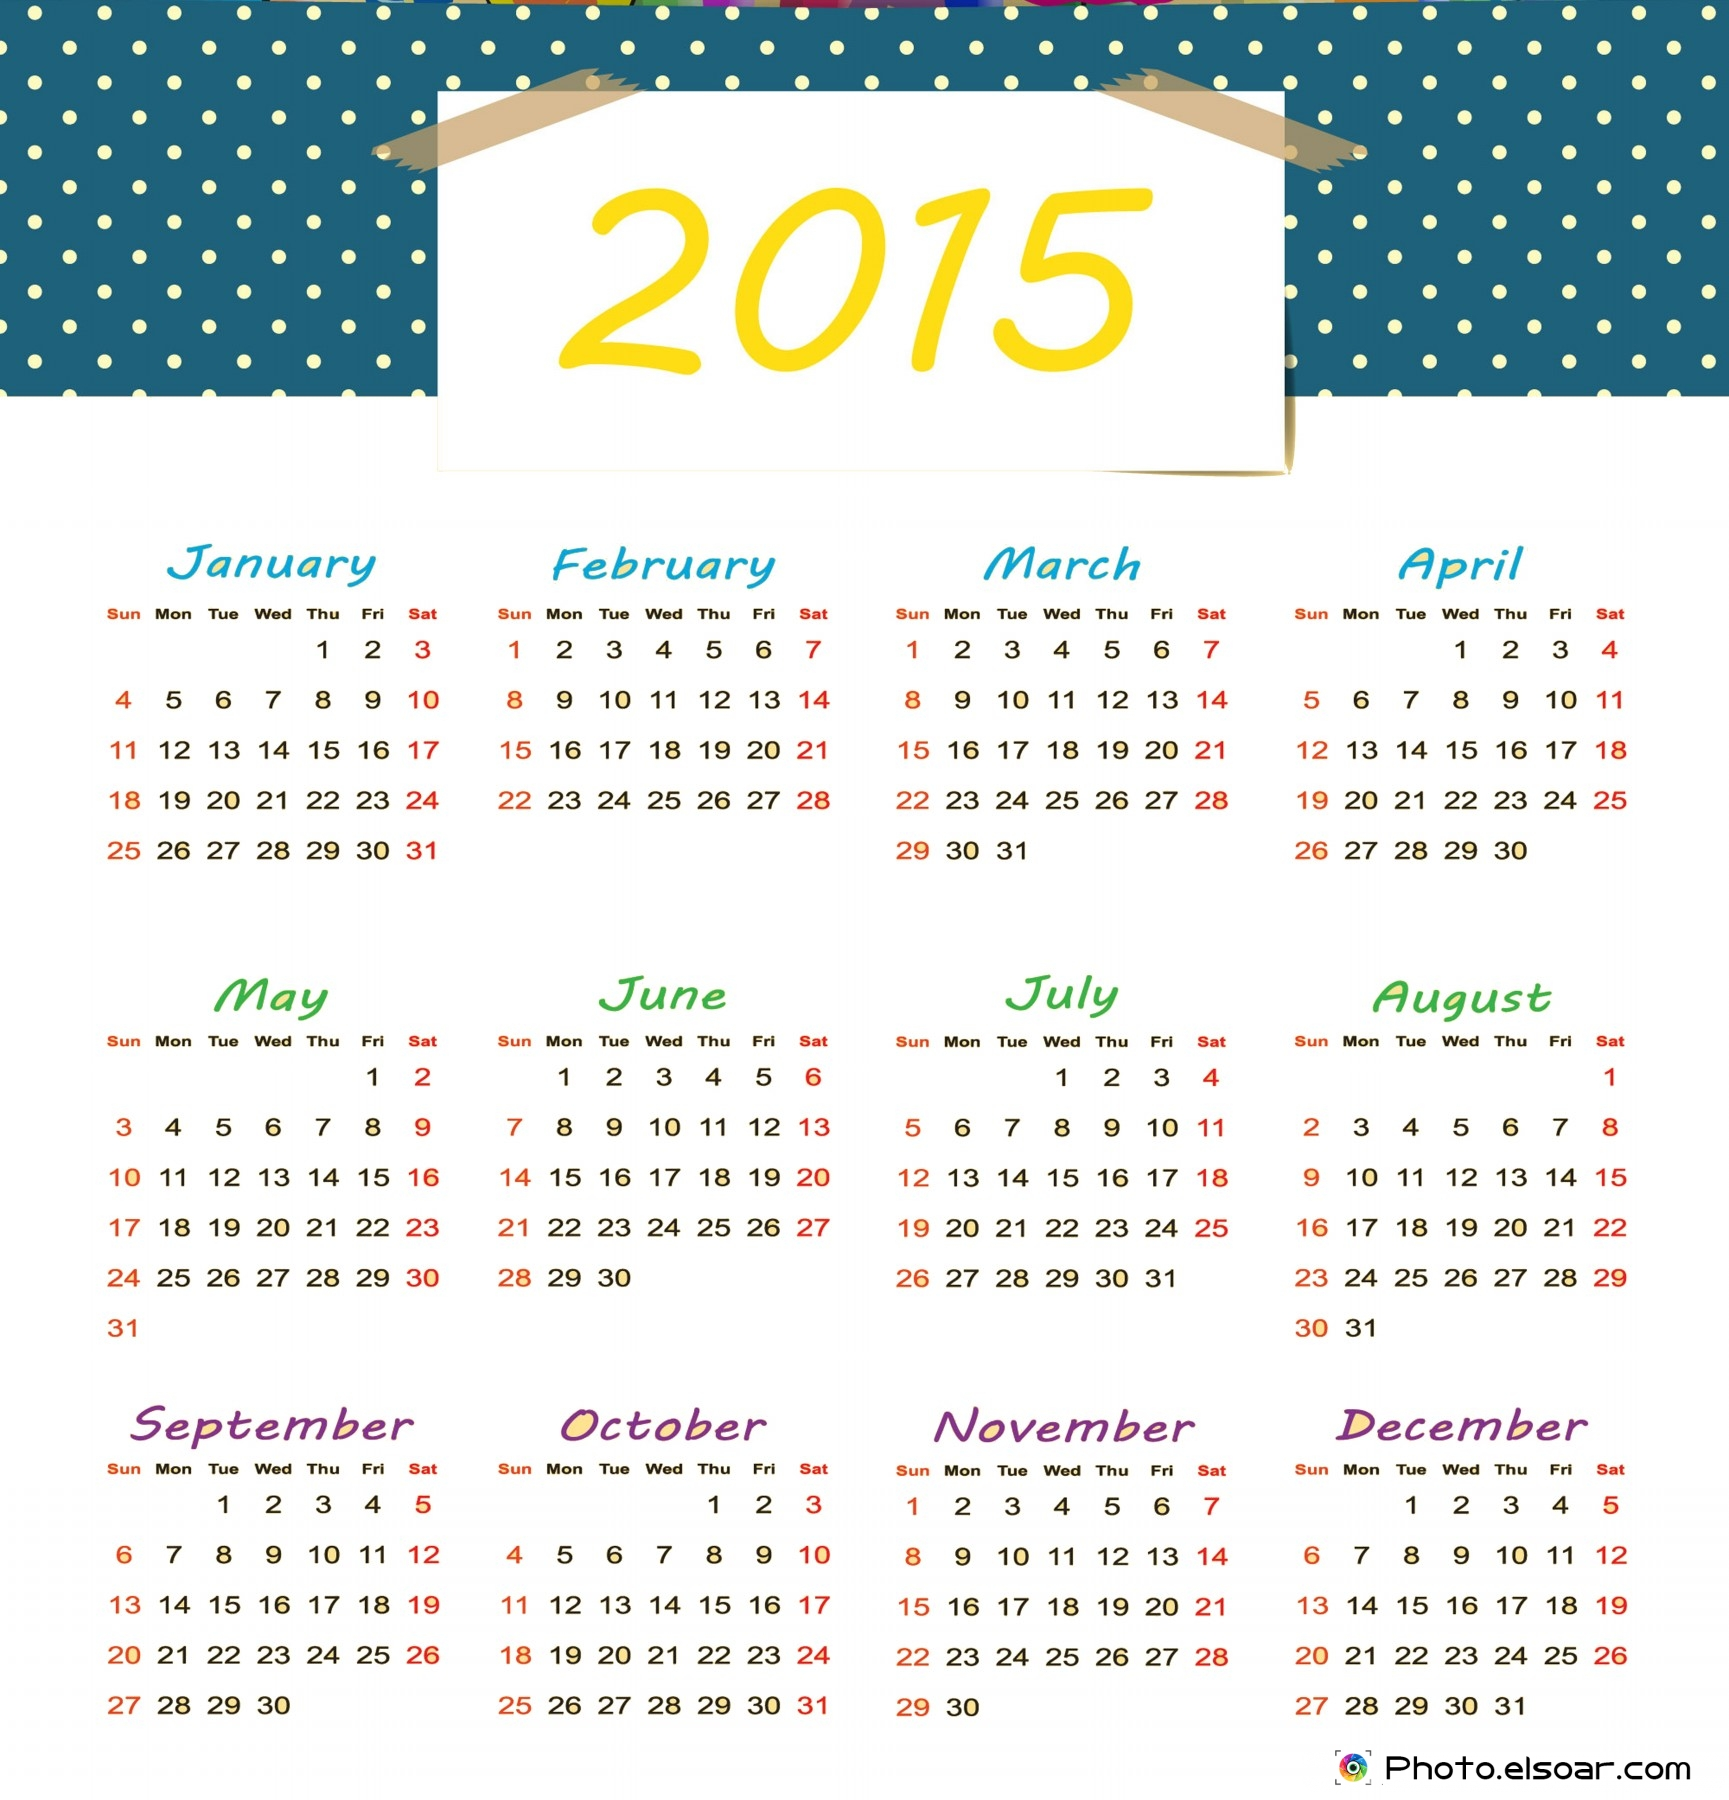 1729 x 1800 · 736 kB · jpeg, 2015 Free Printable Calendars Com